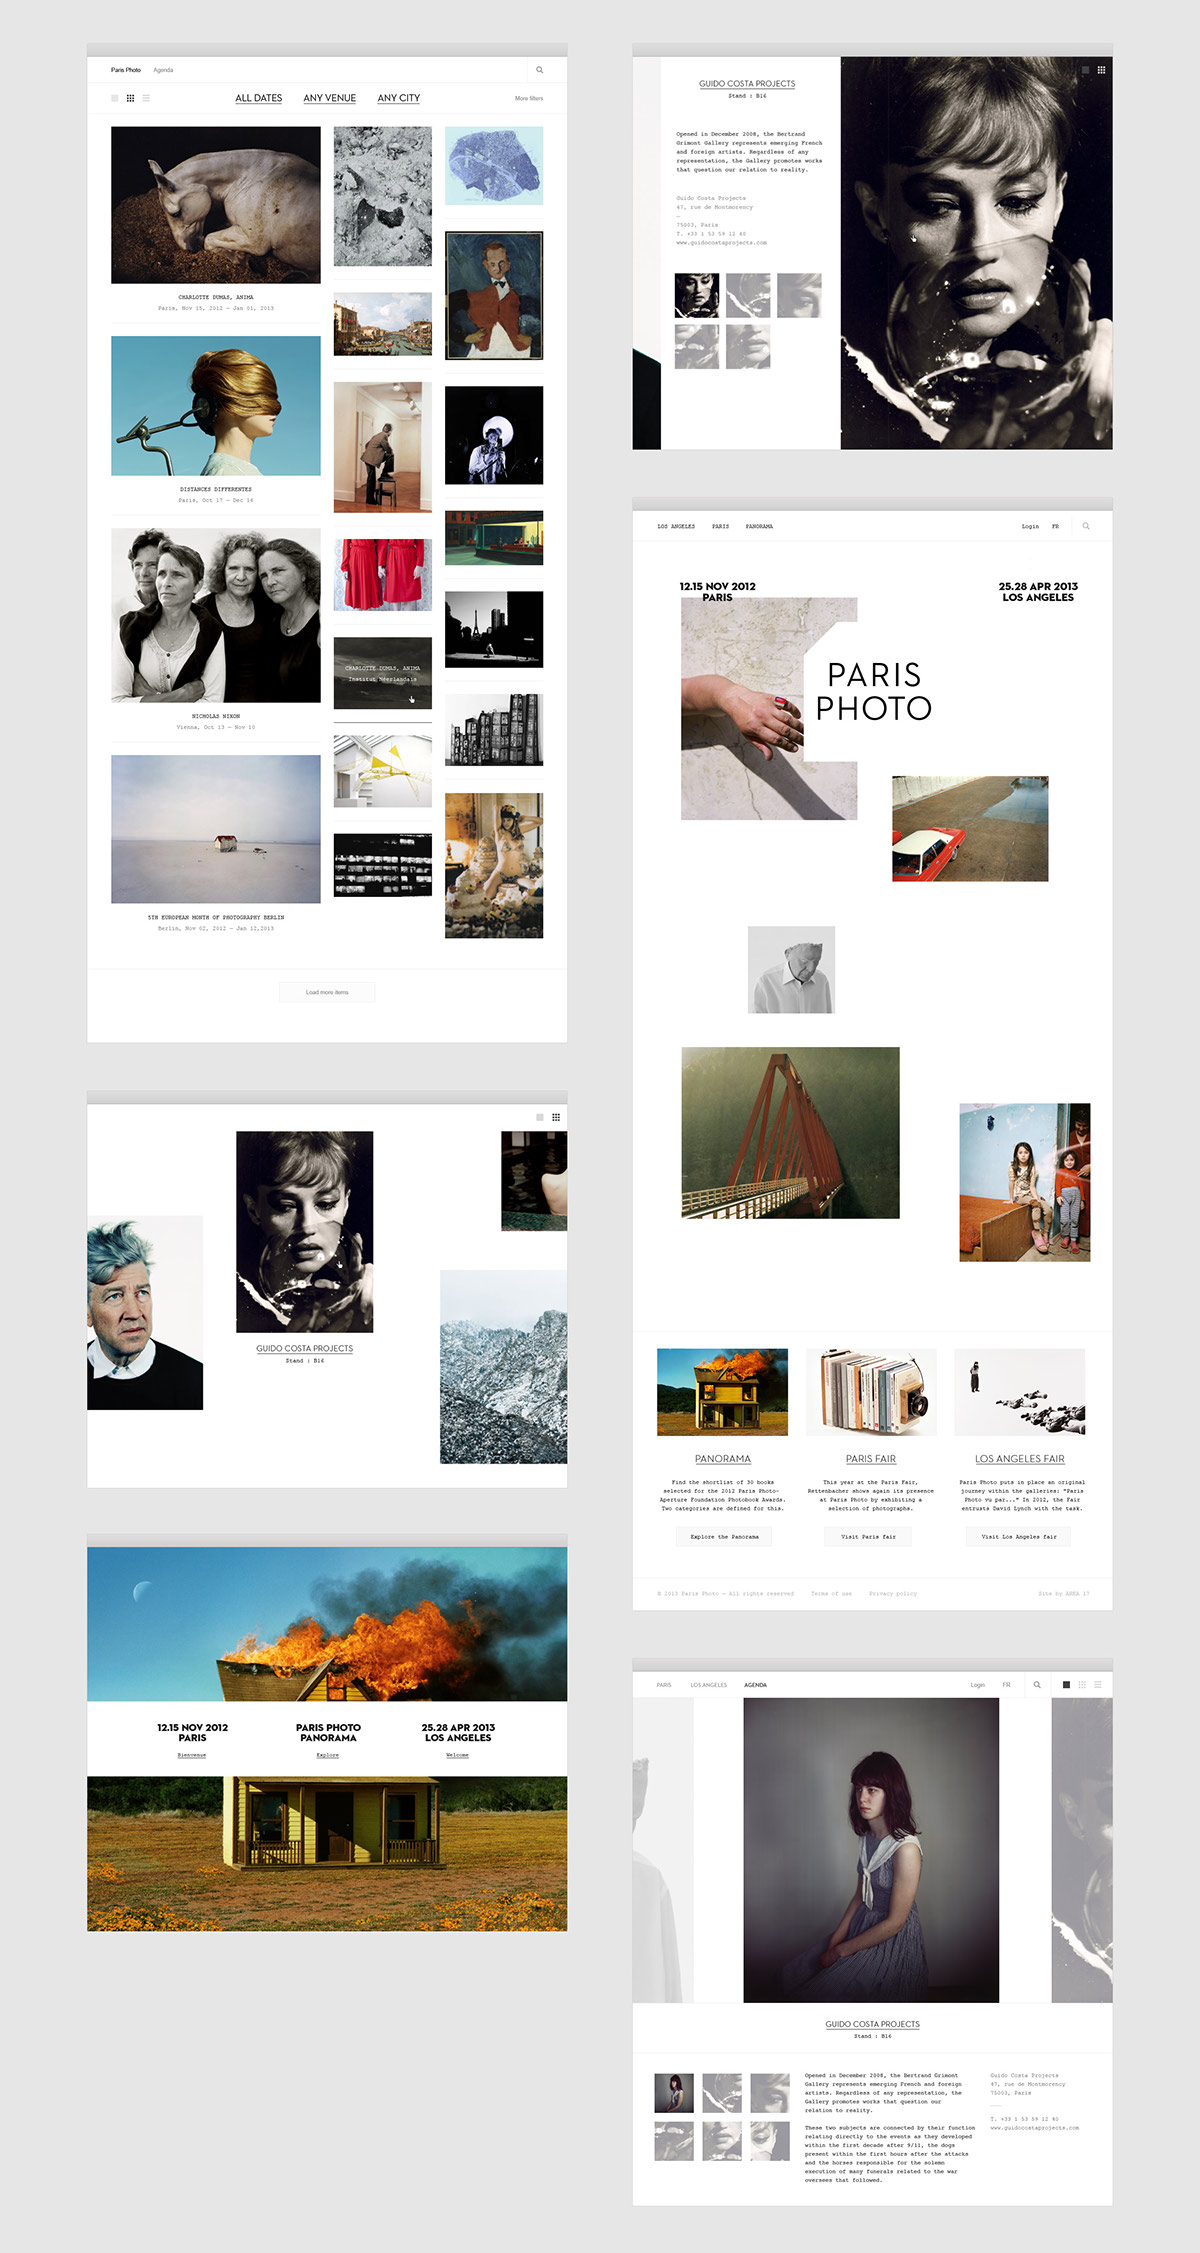 Paris Photo Photography Fair David Lynch KRRB buy local